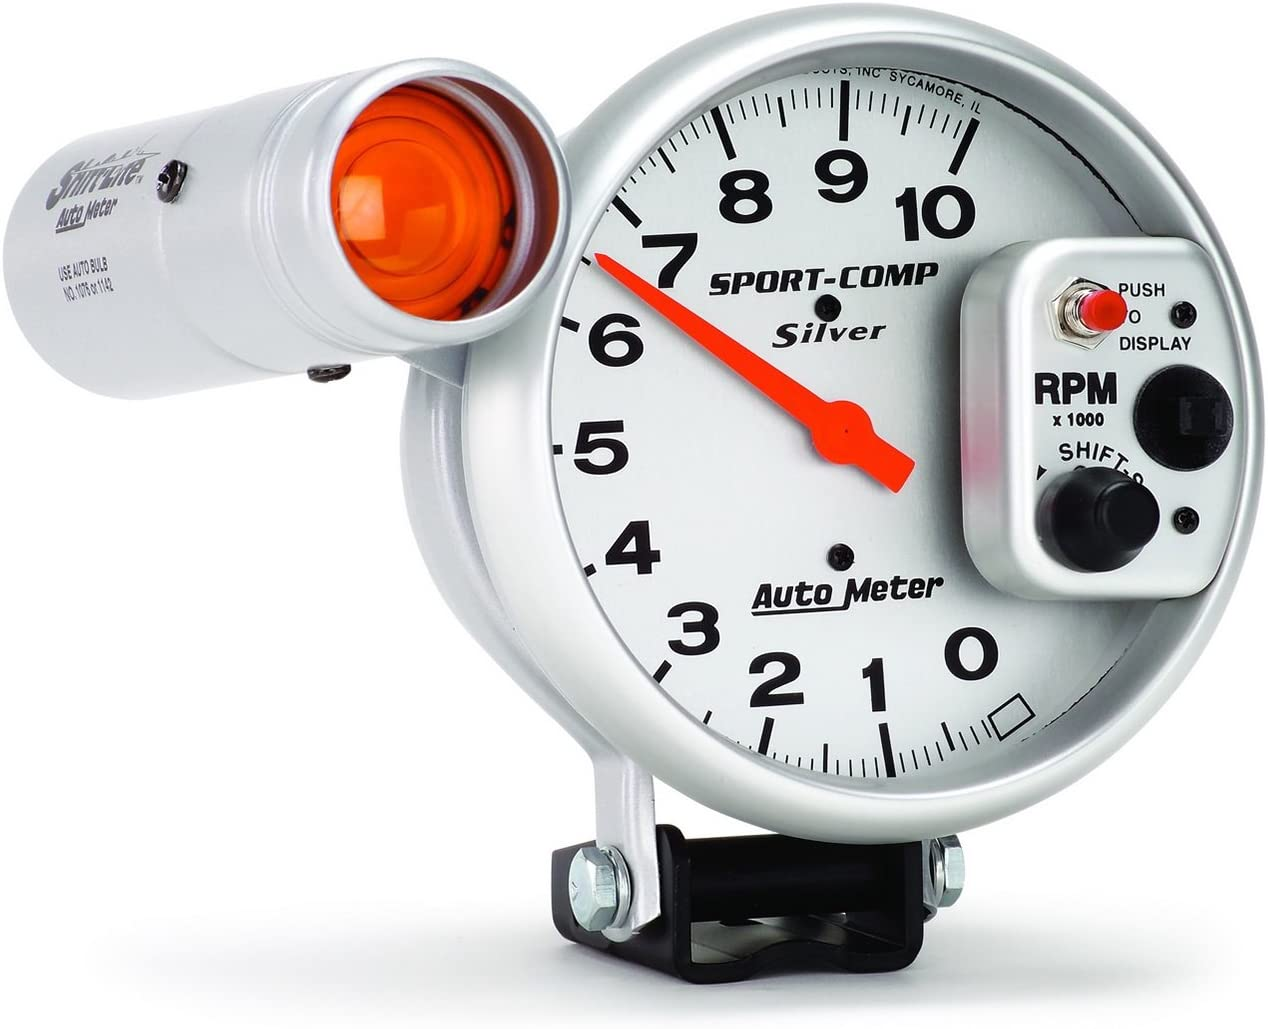 Auto Meter 3911 Sport-Compact Pedestal Mount Shift-Lite Tachometer Gauge